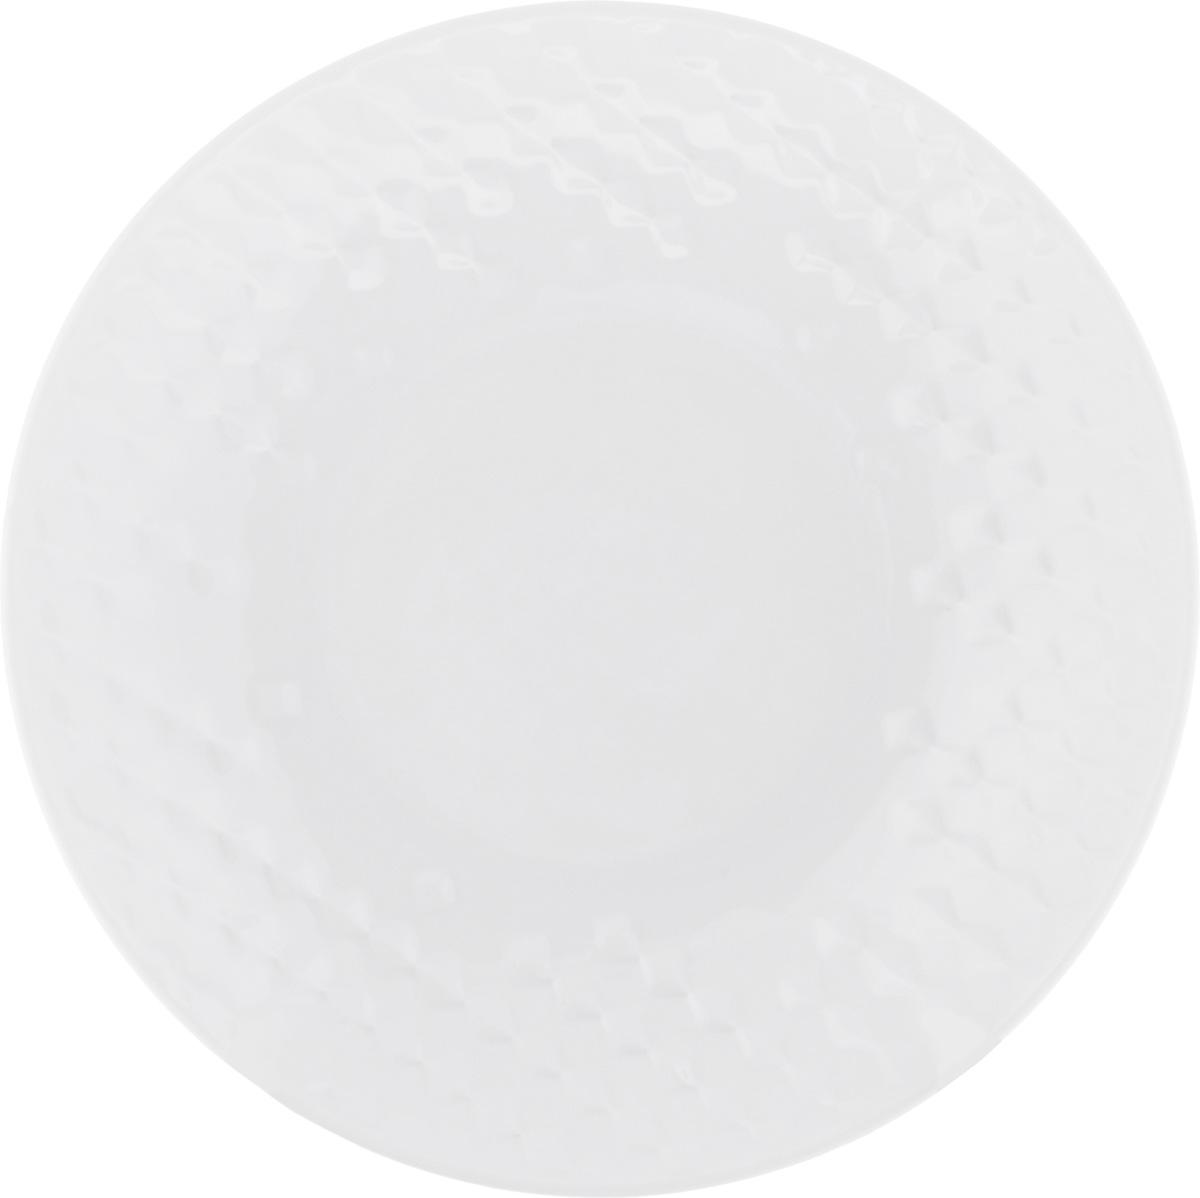 Тарелка суповая Walmer Sapphire, цвет: белый, диаметр 21 см тарелка суповая поэма анис 21 5см 955623